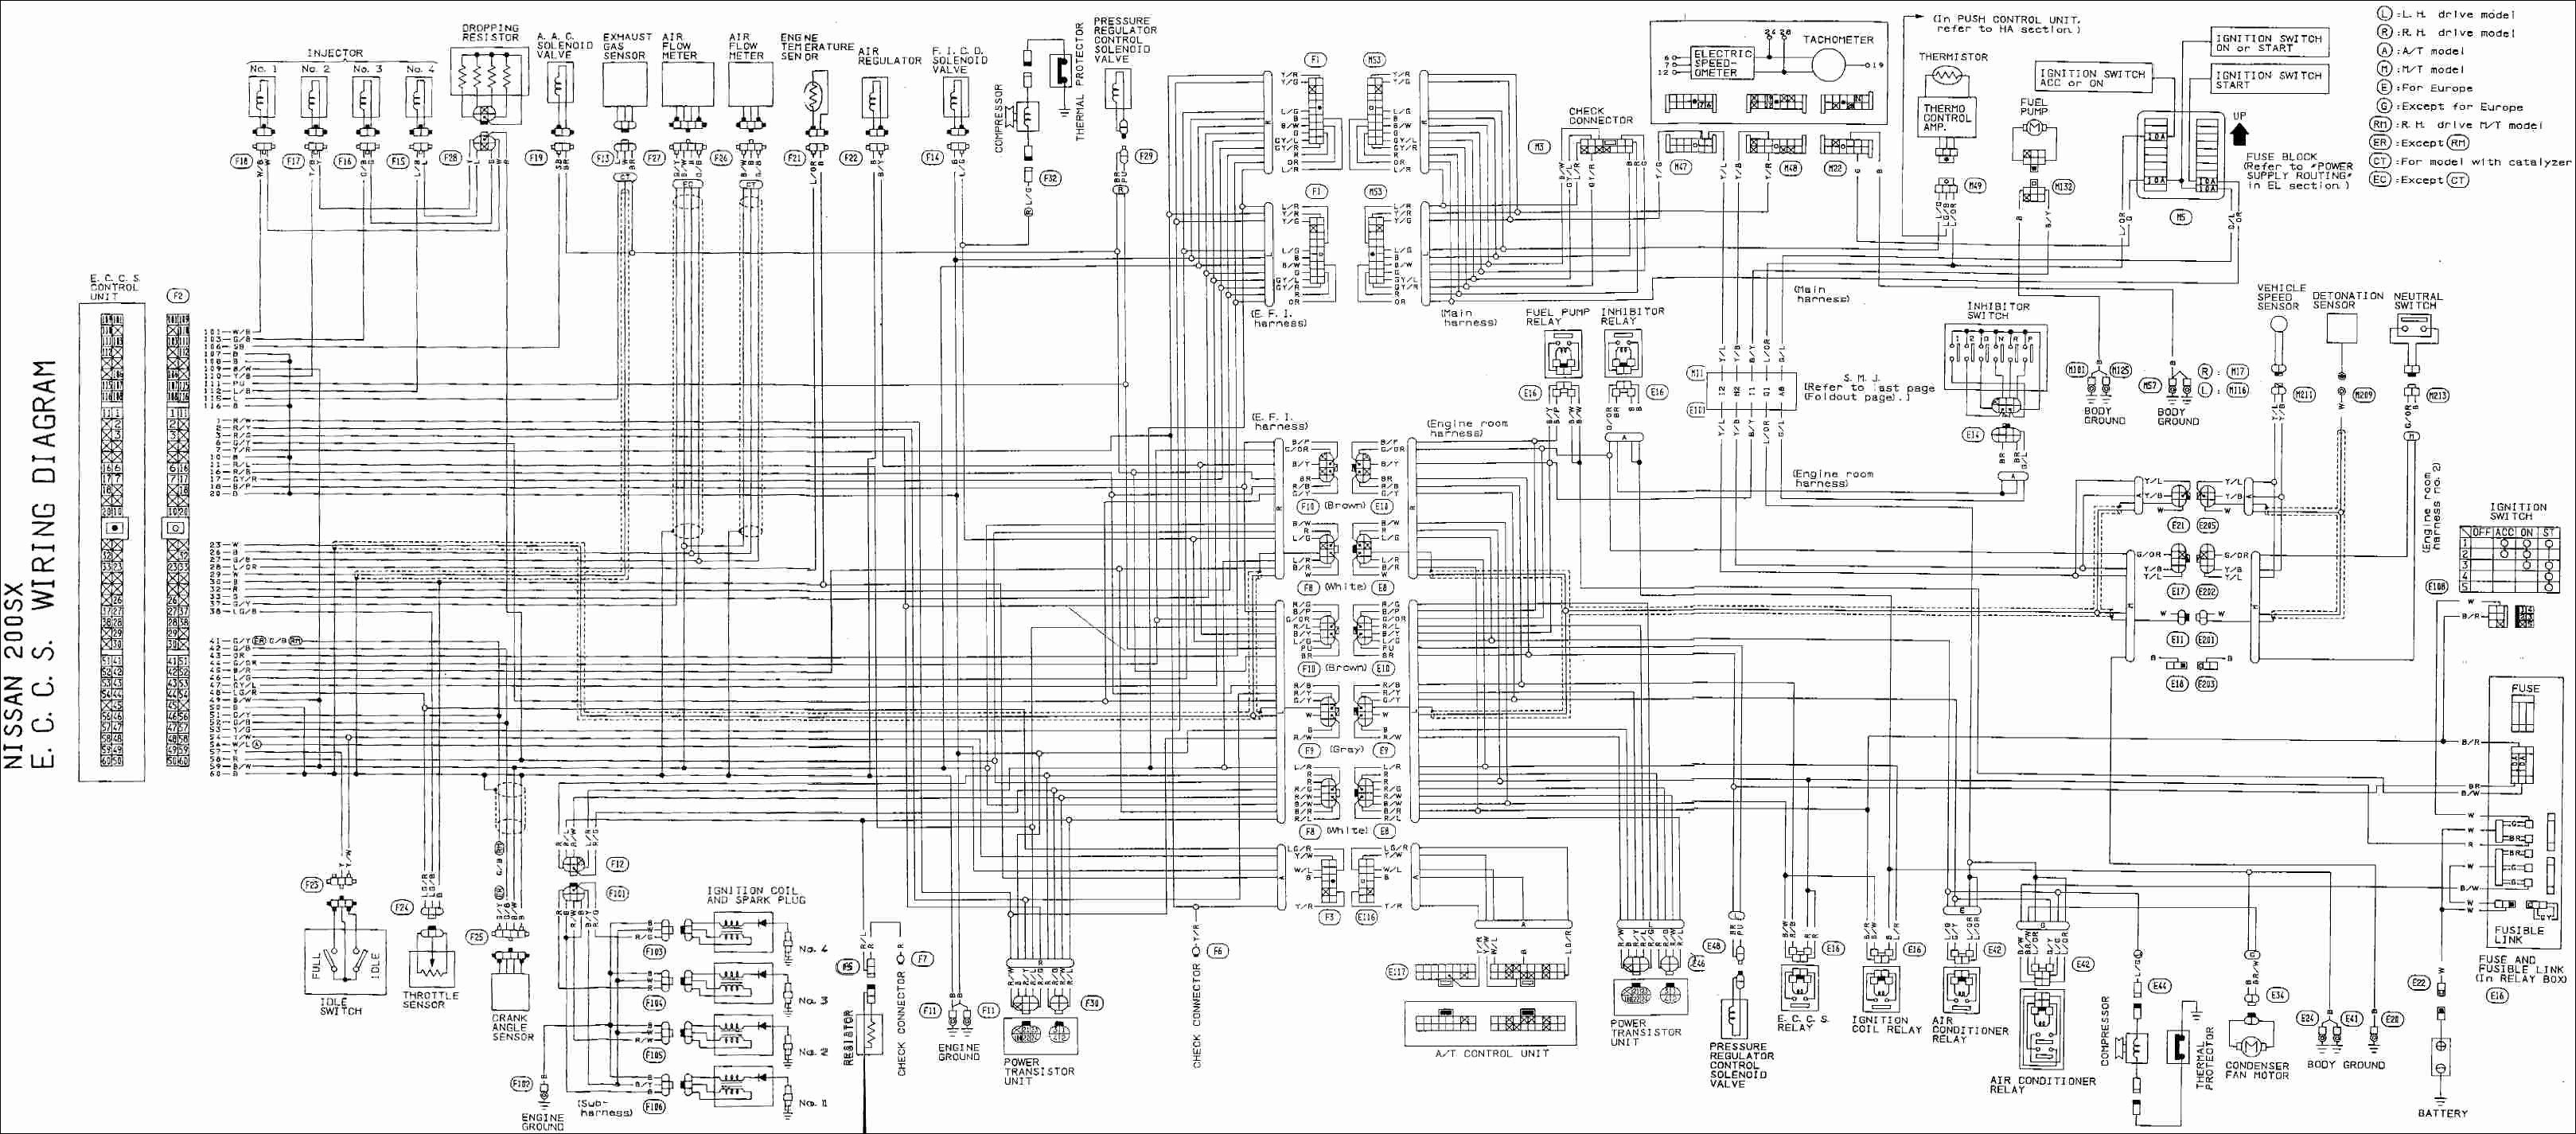 Ford Hei Distributor Wiring Diagram Inspirational Nissan Ka24 Distributor Wiring Diagram Wire Center •